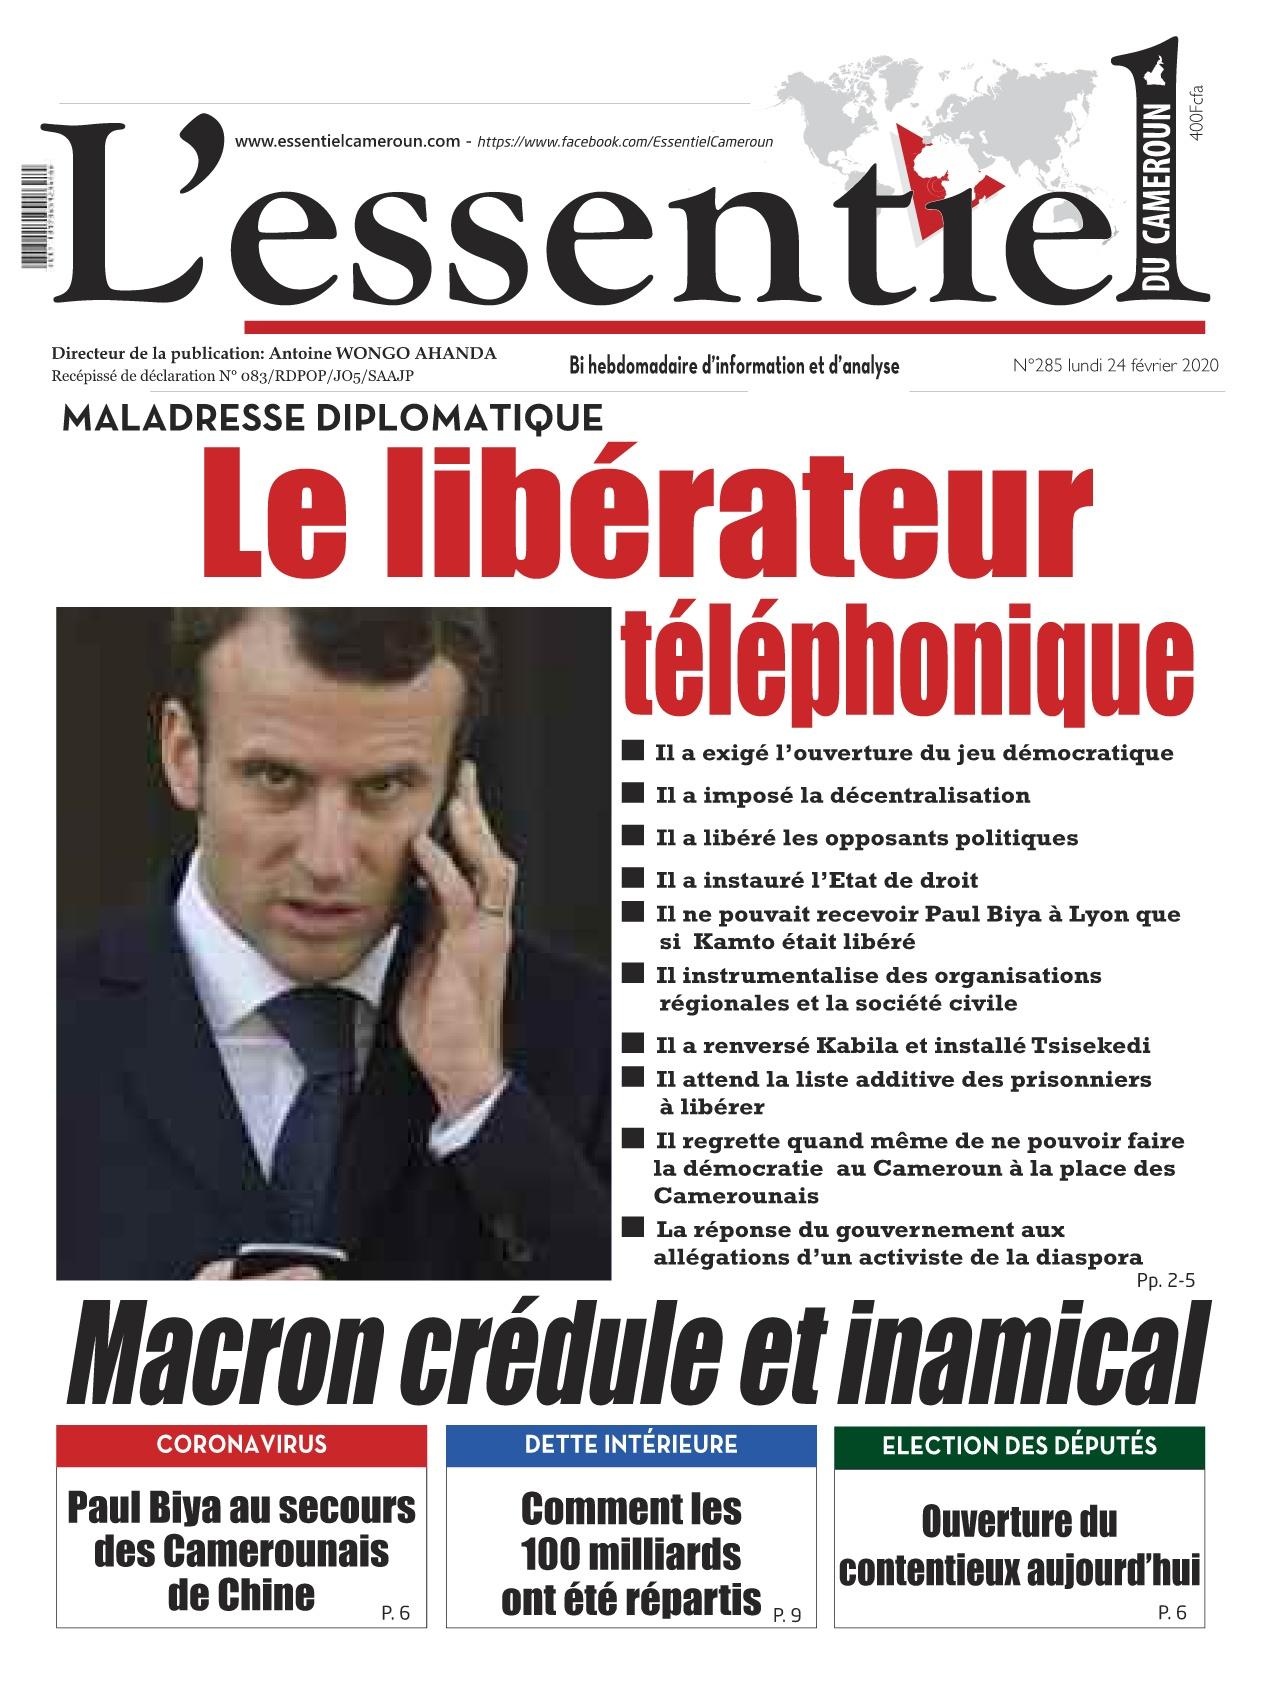 L'essentiel du Cameroun - 24/02/2020